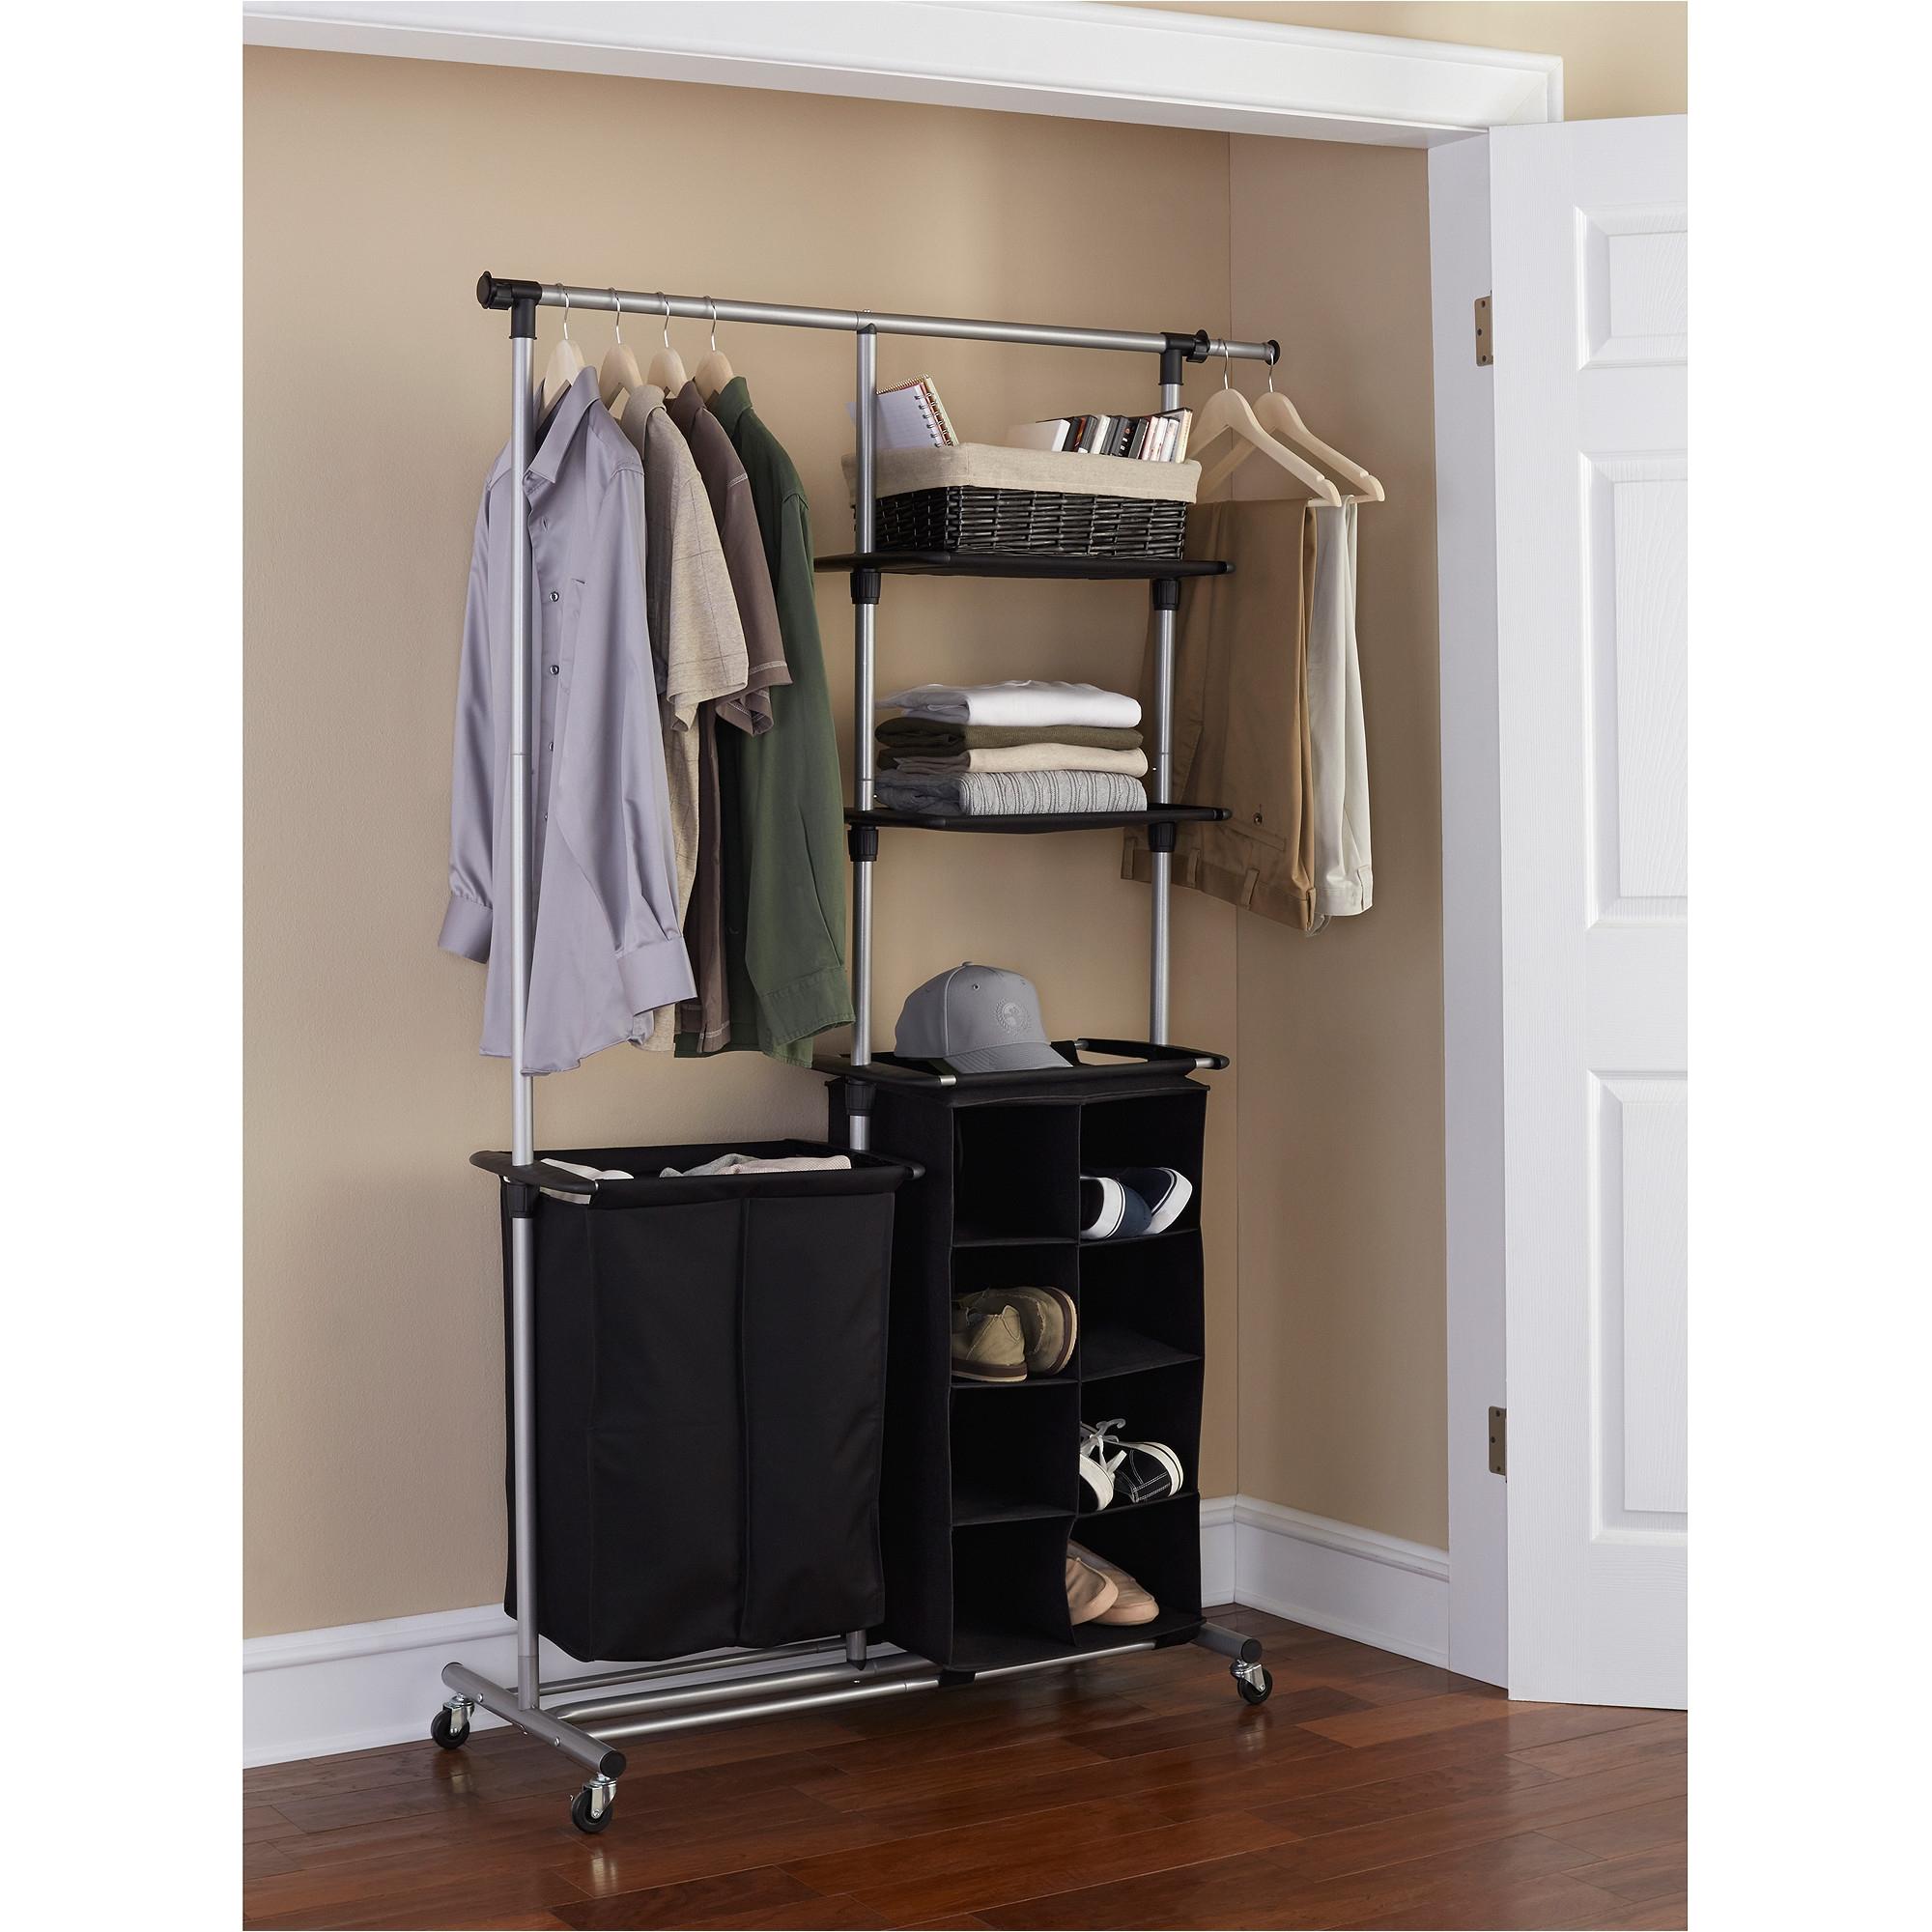 Walmart Clothing Rack Canada Ideas organizer Bins Walmart Clothes Rack Closet Storage as Well